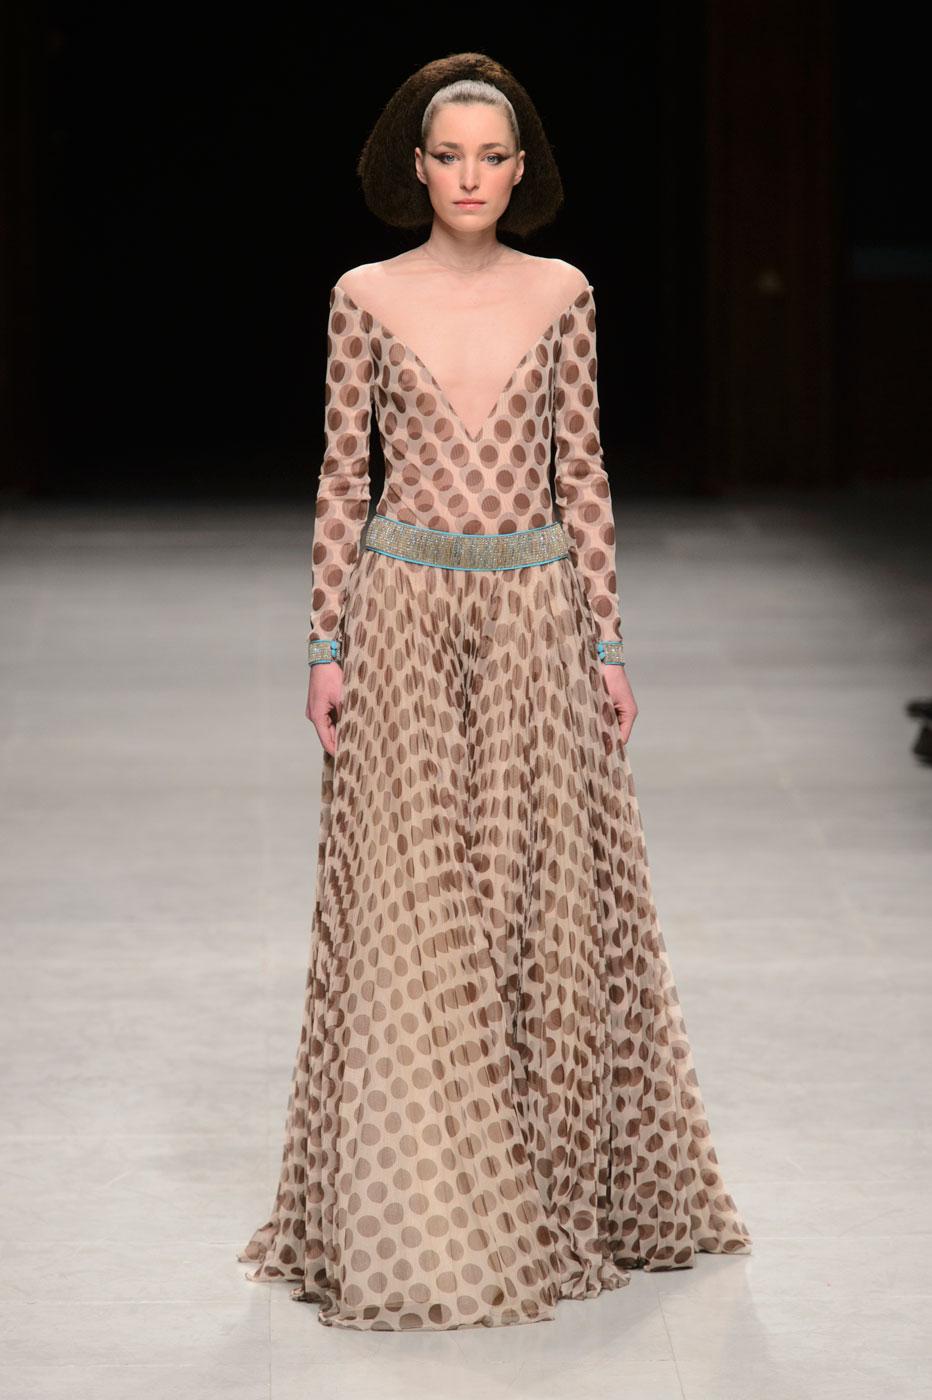 Julien-Fournie-Prive-fashion-runway-show-haute-couture-paris-spring-2015-the-impression-38